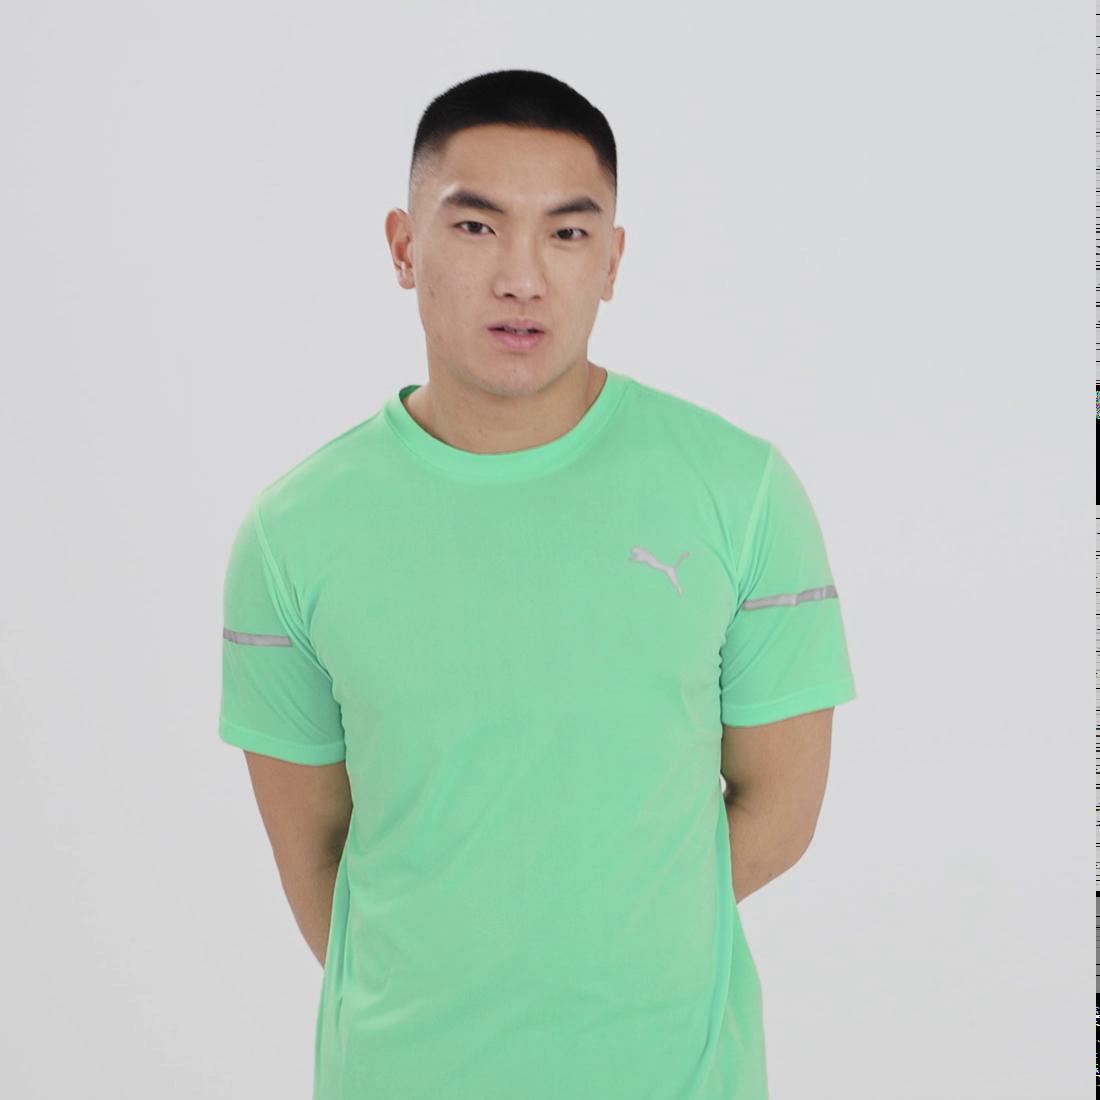 Image PUMA Camiseta Runner ID Thermo R+ Masculina #9